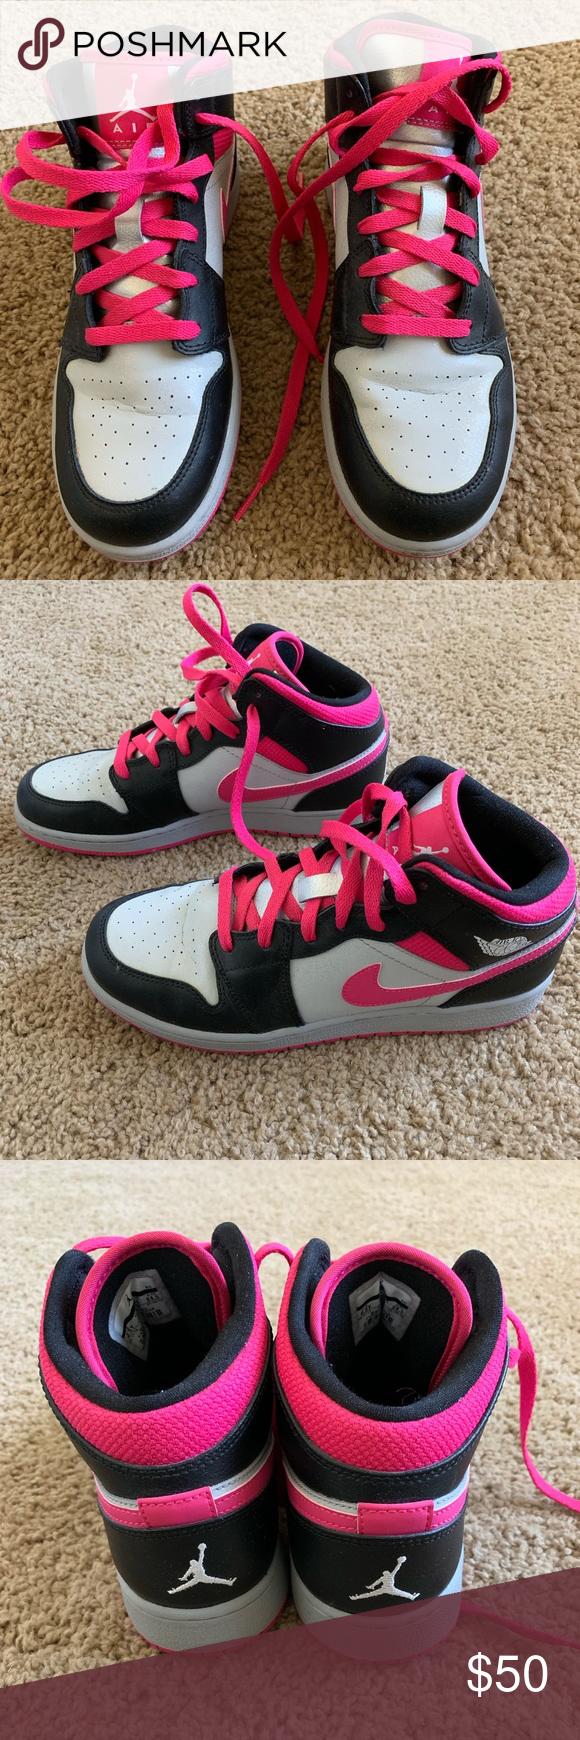 Nike Air Jordan 1 - Women's 8/Youth 6.5